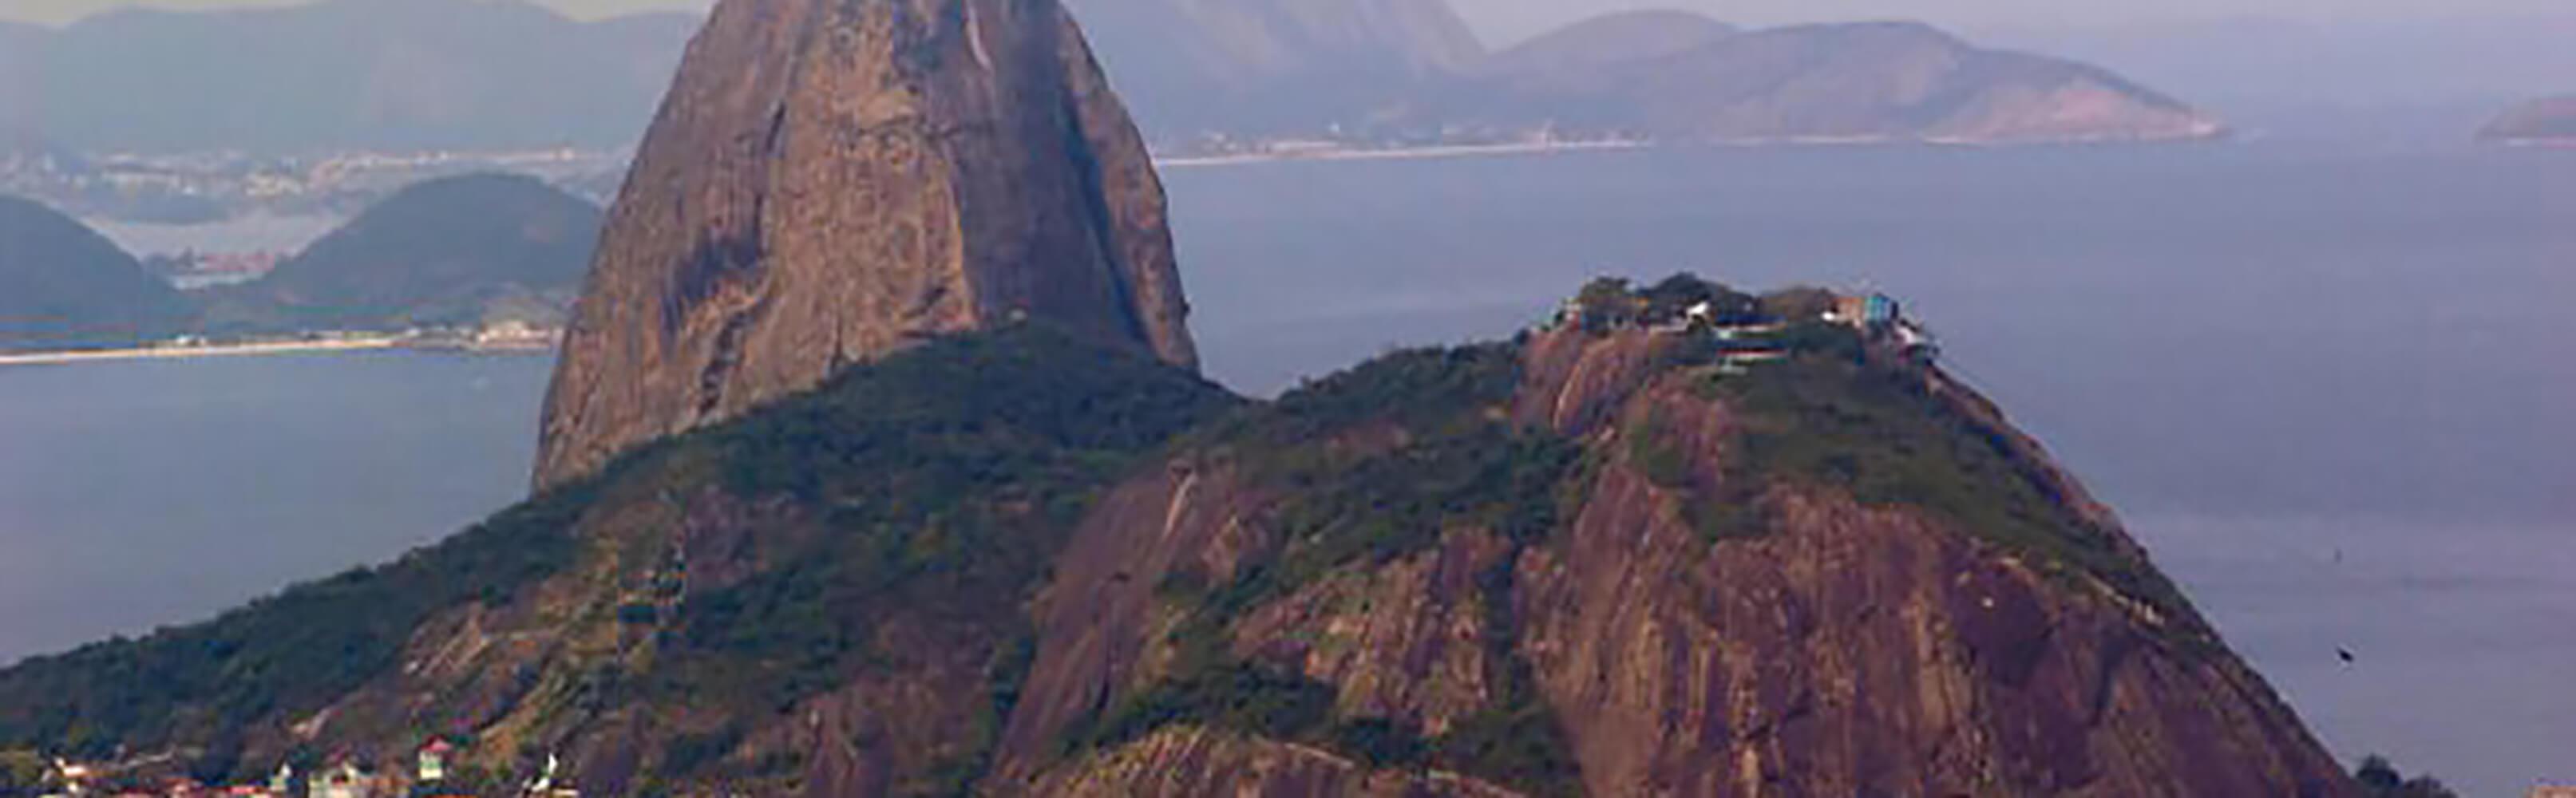 Zuckerhut (Rio de Janeiro) 1